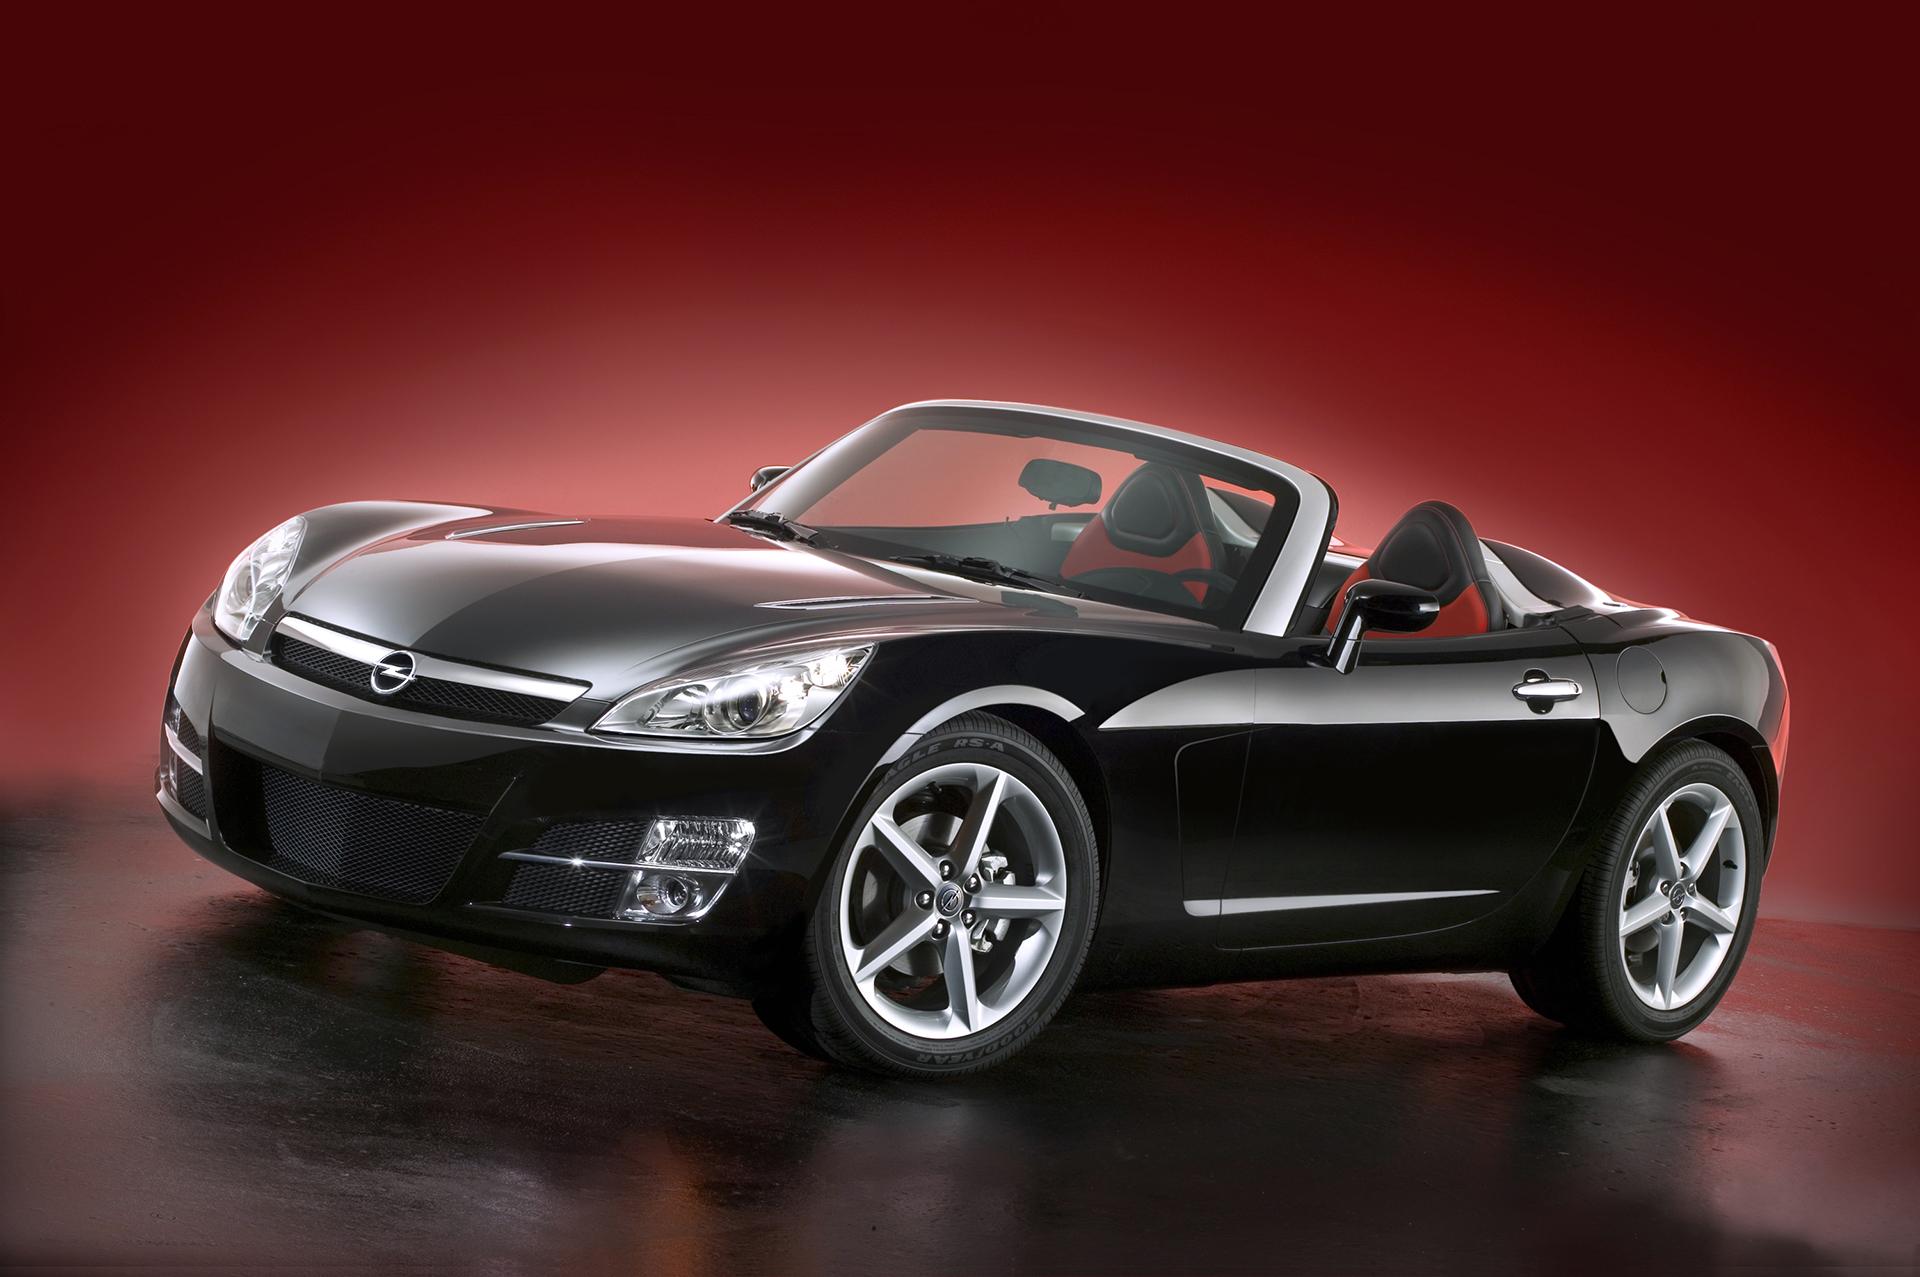 Opel GT front three-quarter